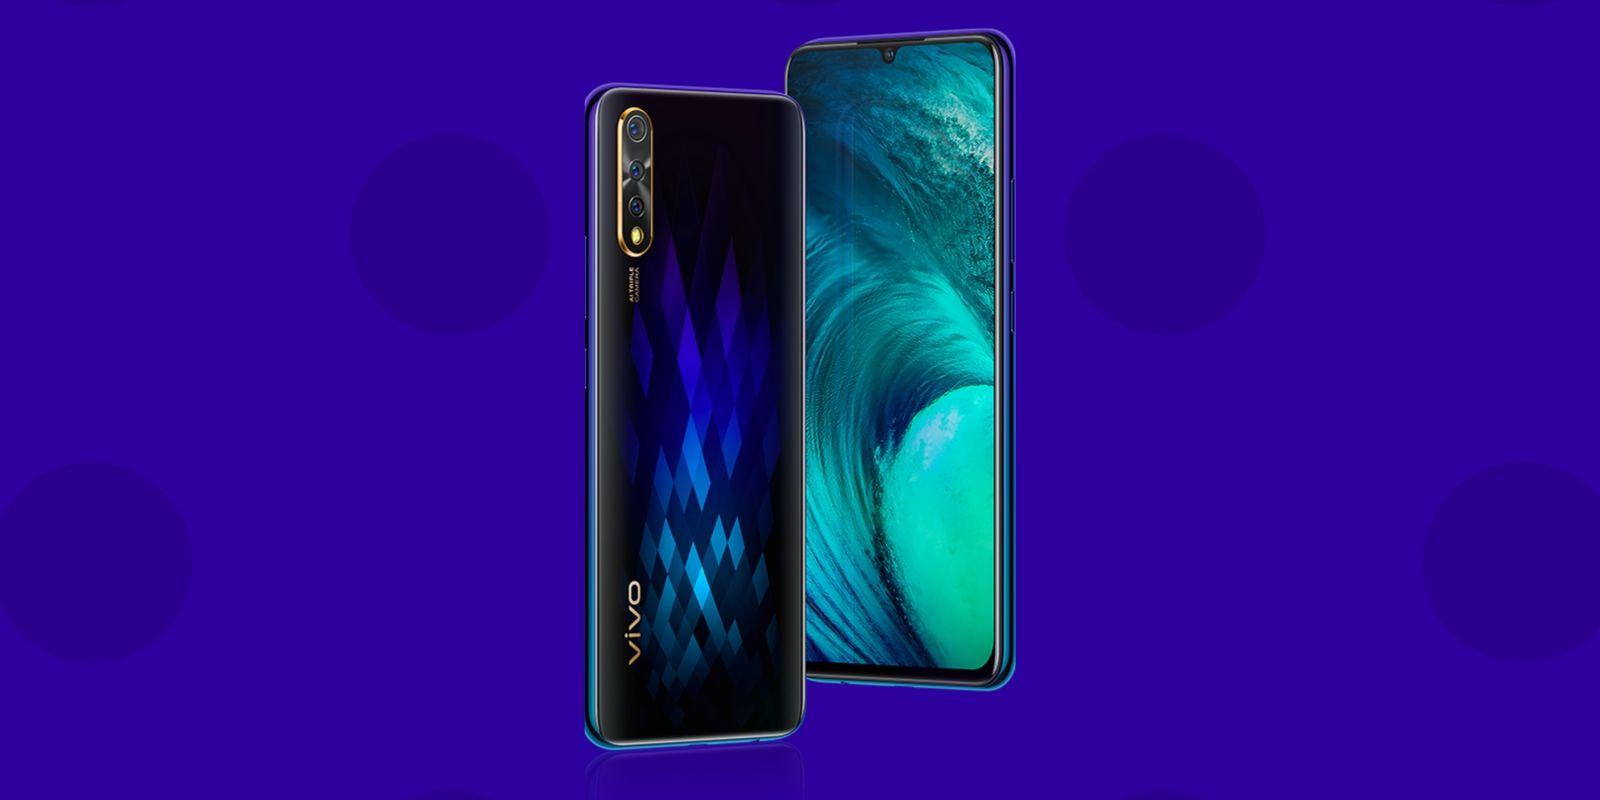 Vivo S1 smartphone